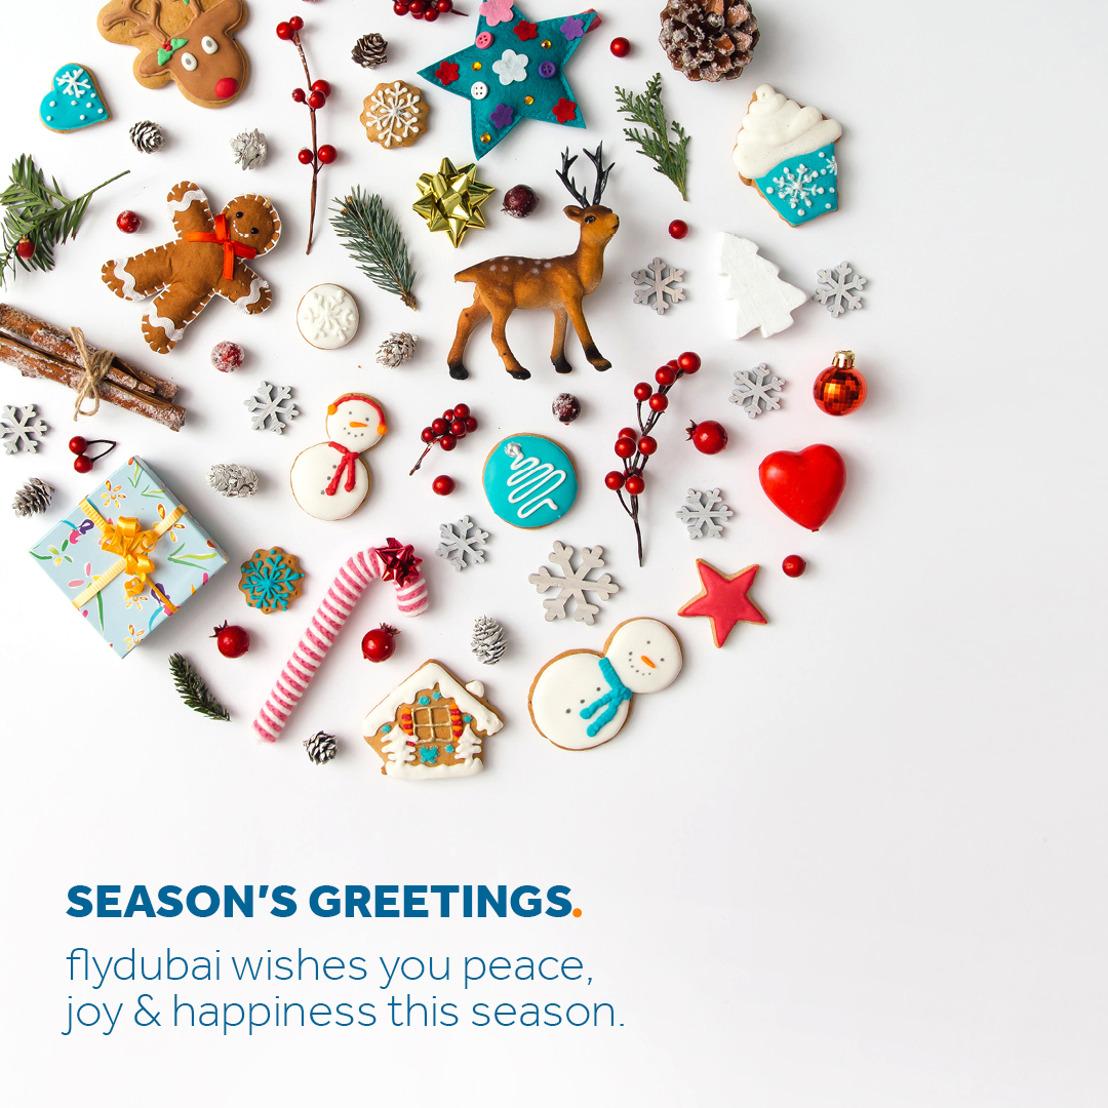 Season's Greetings from flydubai